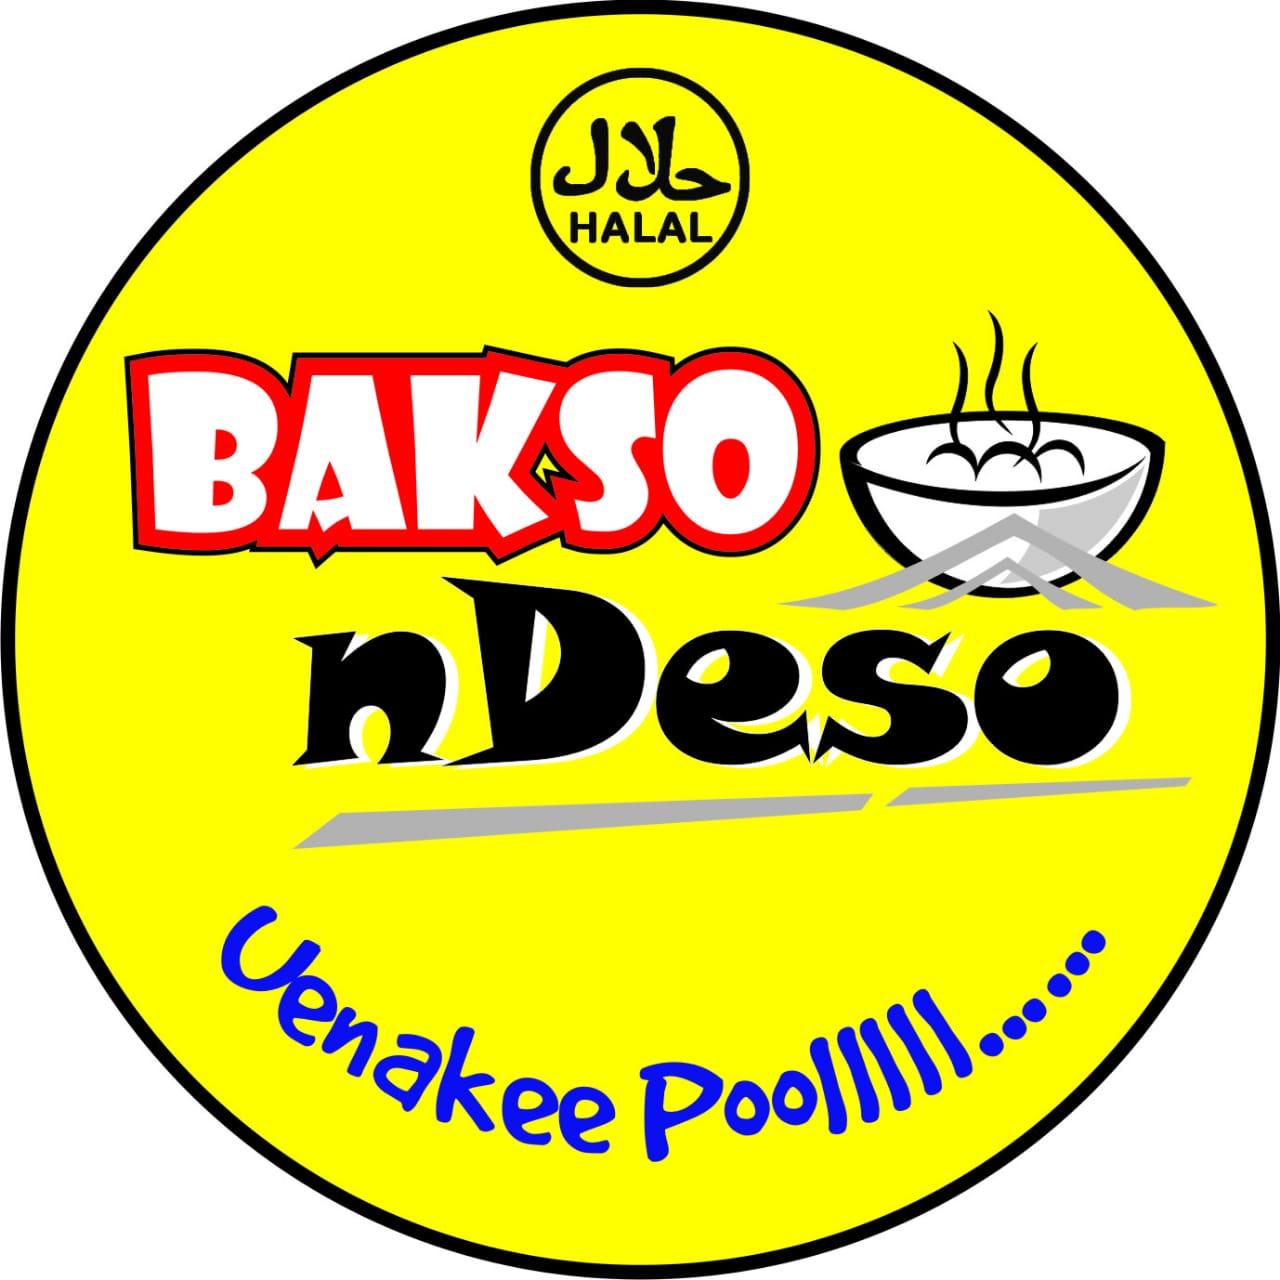 Bakso Ndeso